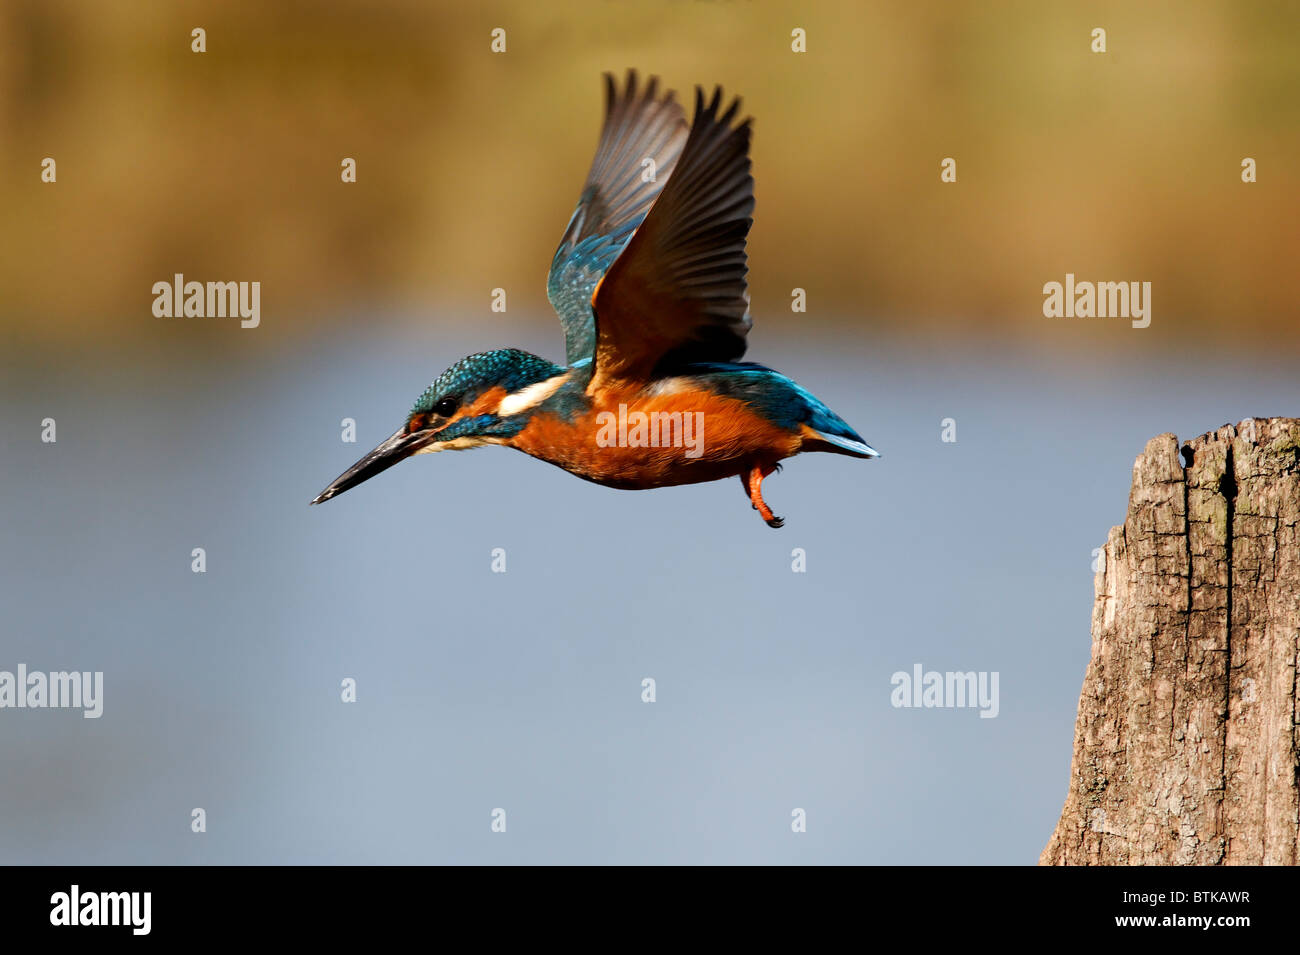 Kingfisher, Alcedo atthis, single bird in flight, Midlands, October 2010 - Stock Image